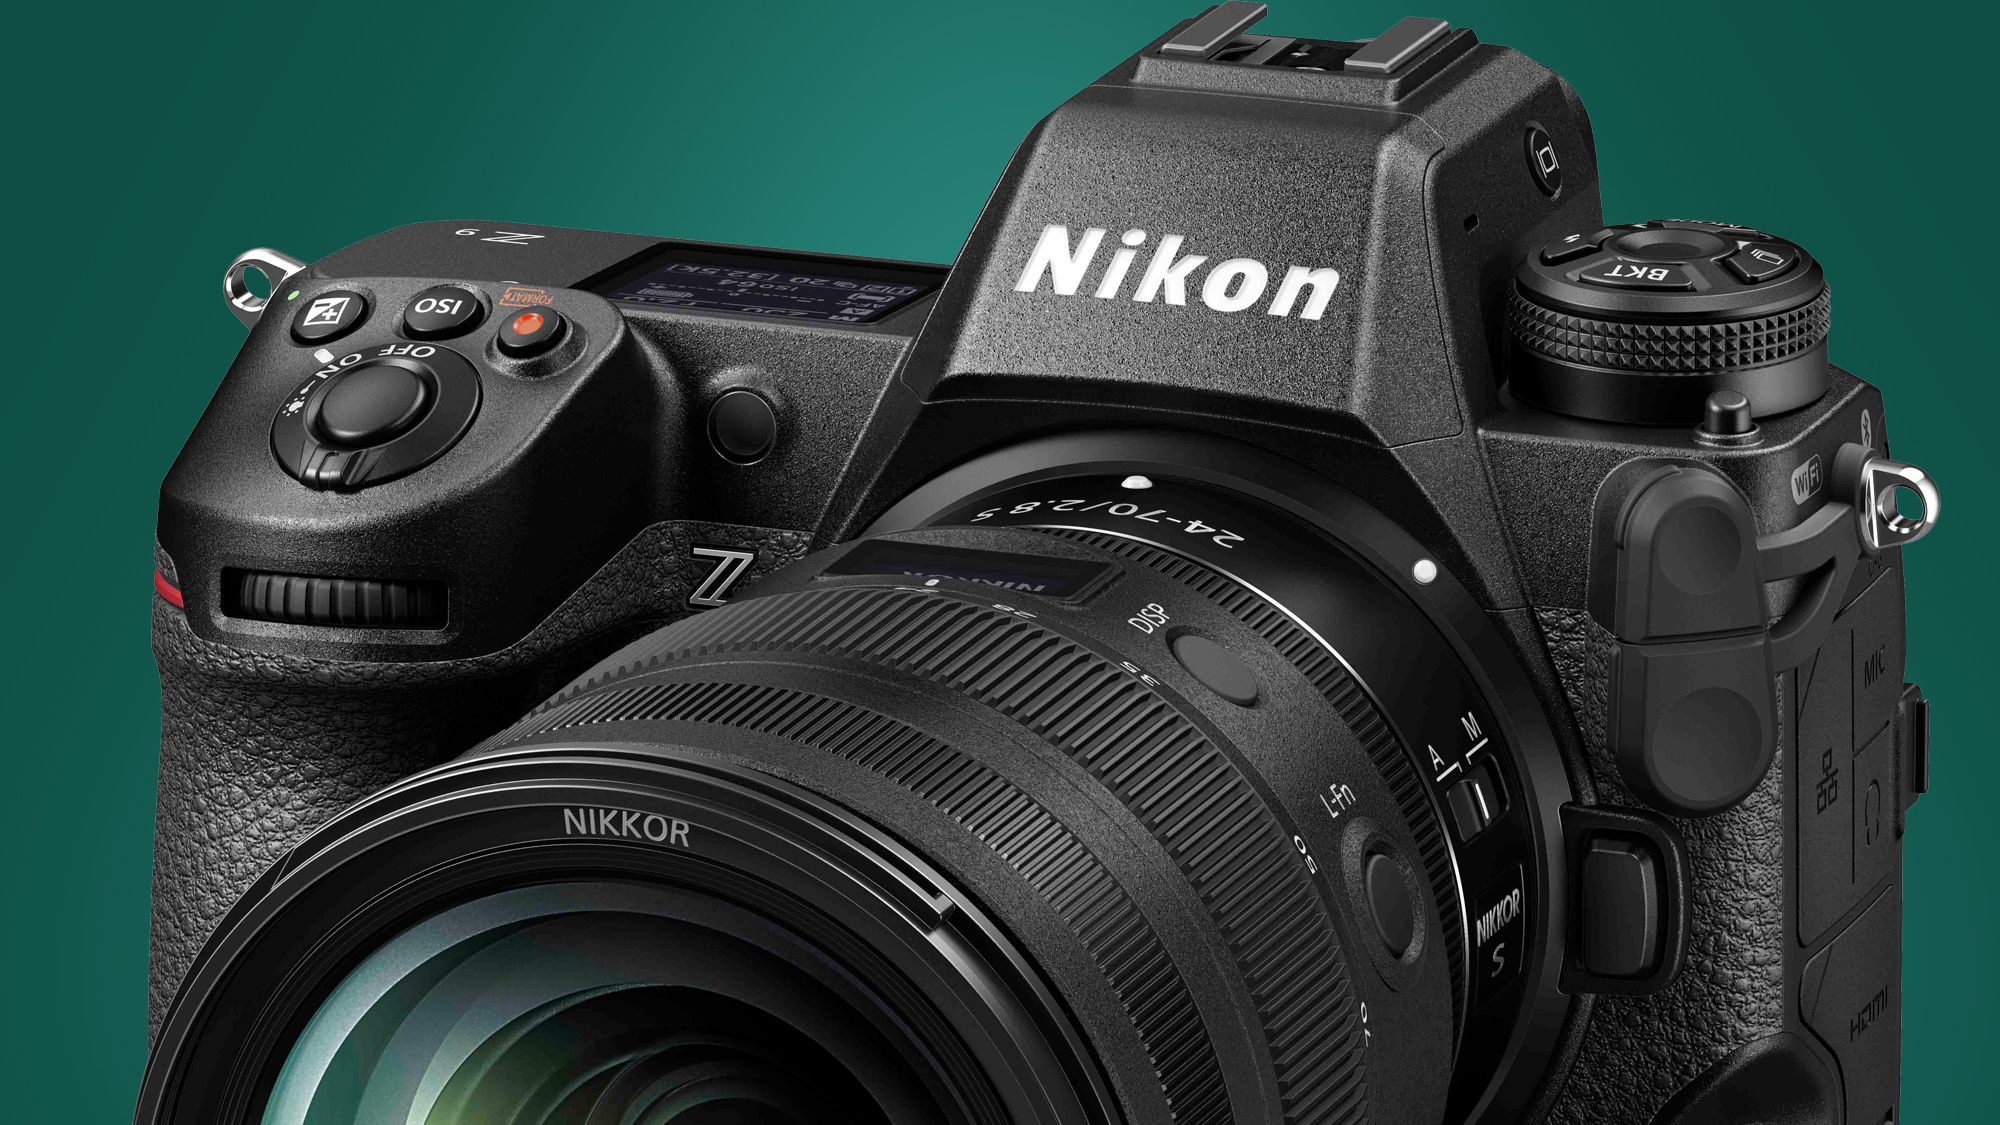 Landmark Nikon Z9 is the leap forward Nikon's mirrorless cameras needed